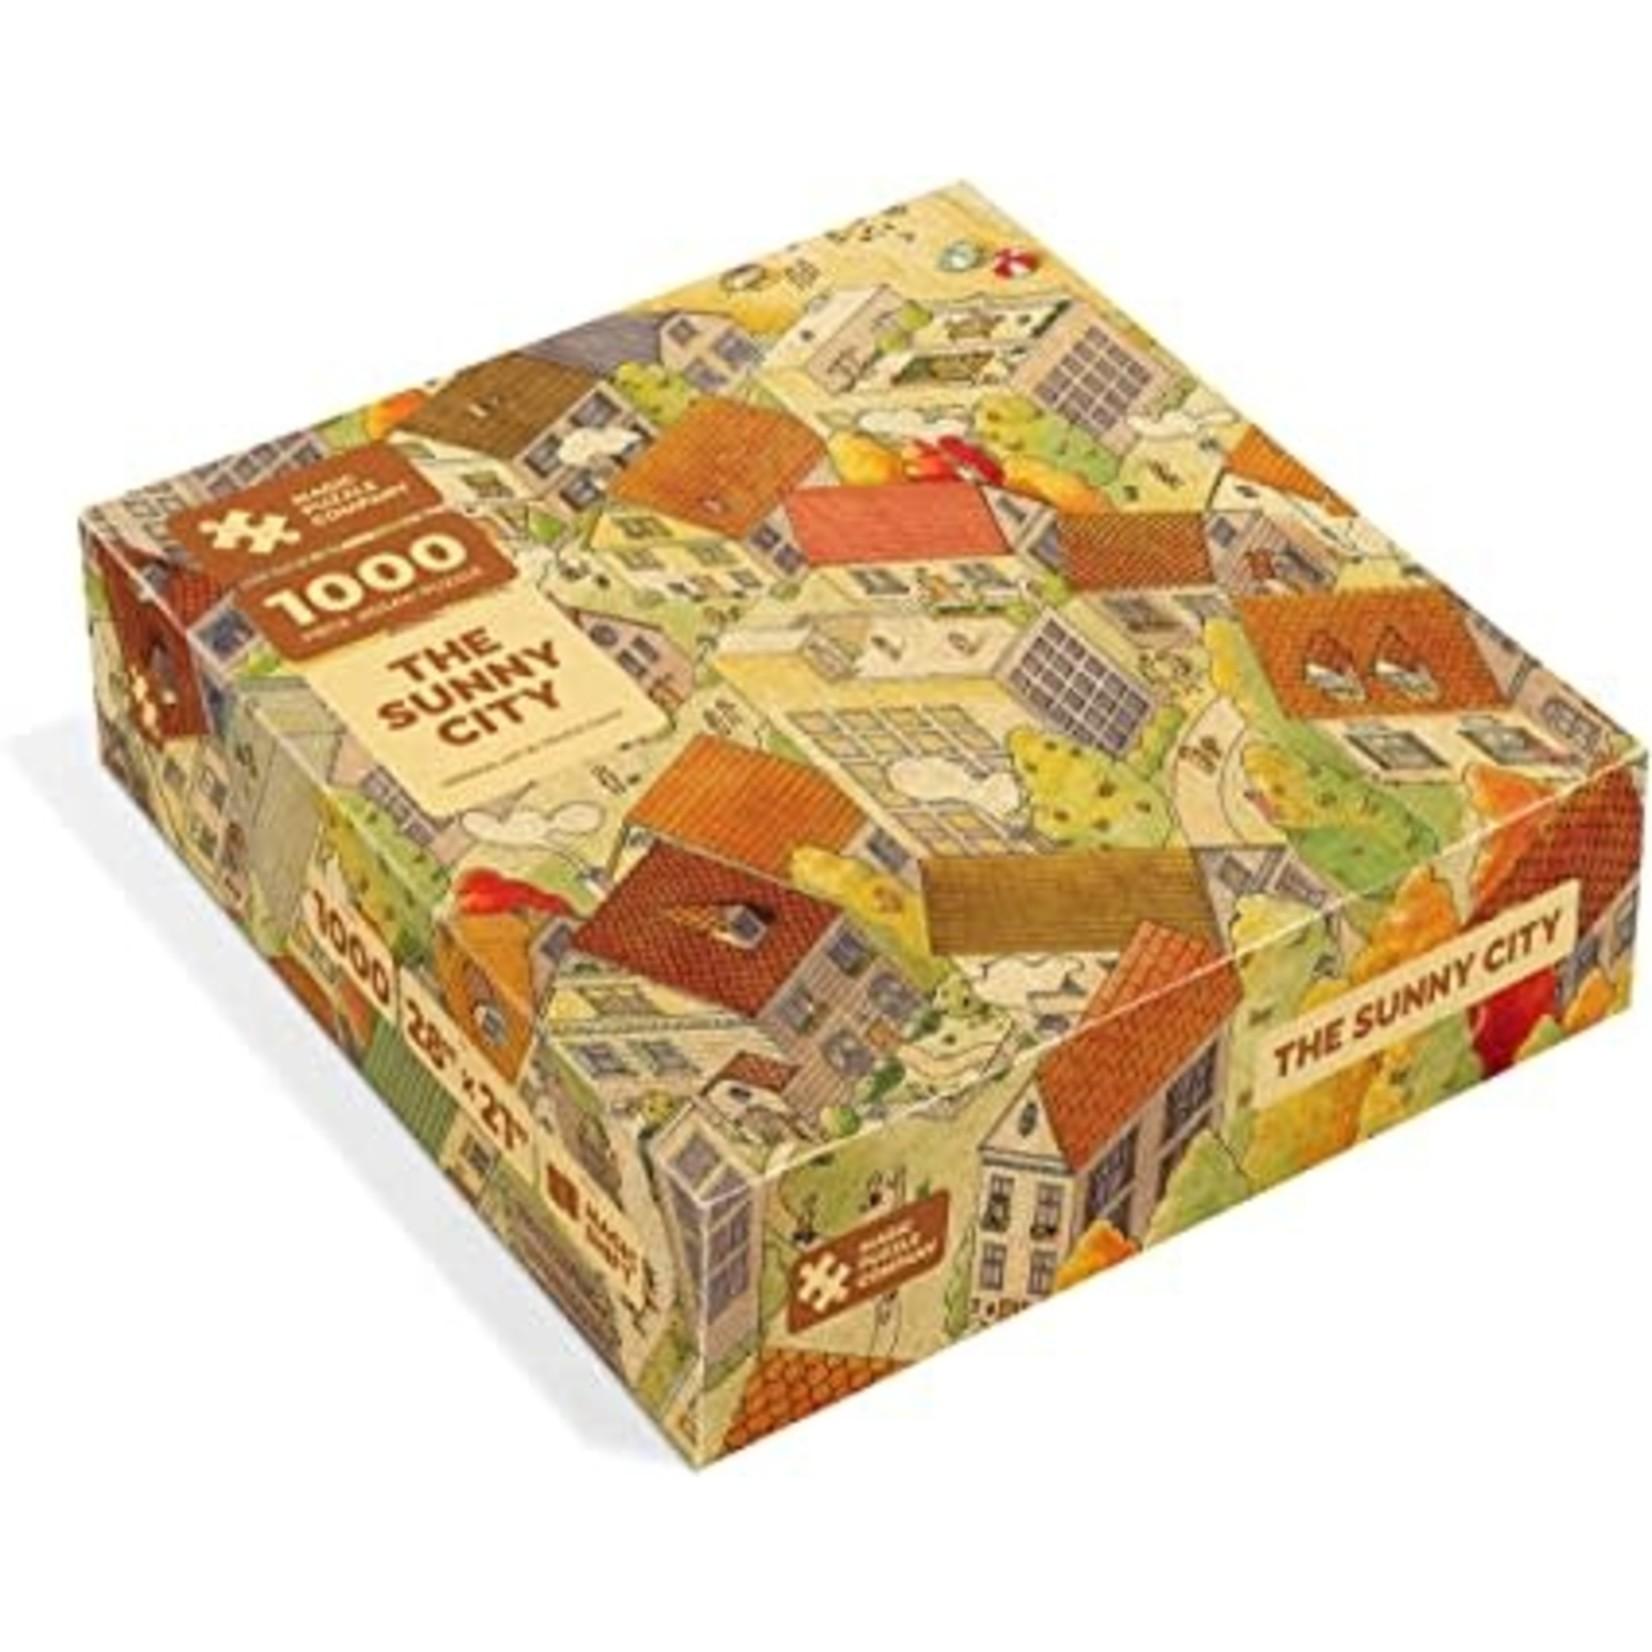 Magic Puzzle Company Magic Puzzle The Sunny City 1000 Piece Jigsaw Puzzle